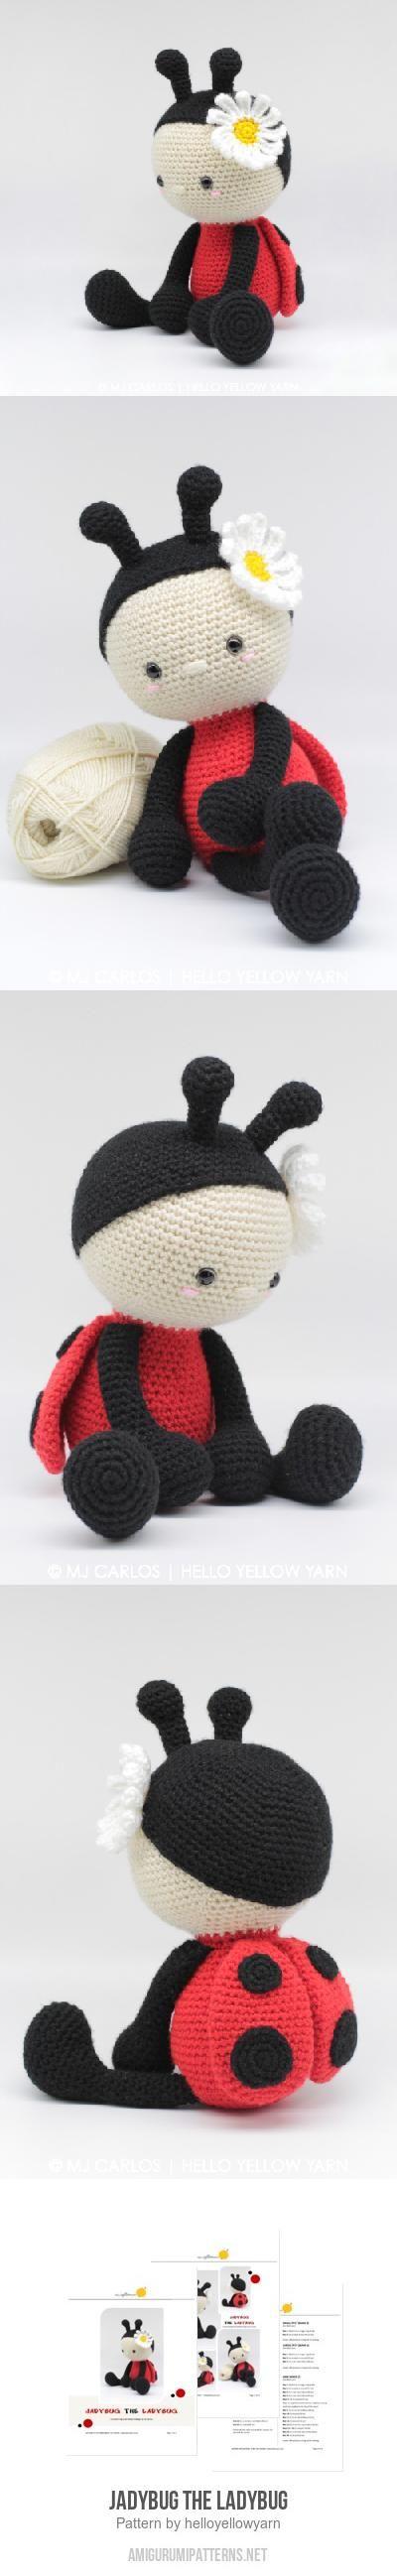 648 best crochet images on pinterest crochet ideas crochet jadybug the ladybug amigurumi pattern bankloansurffo Choice Image